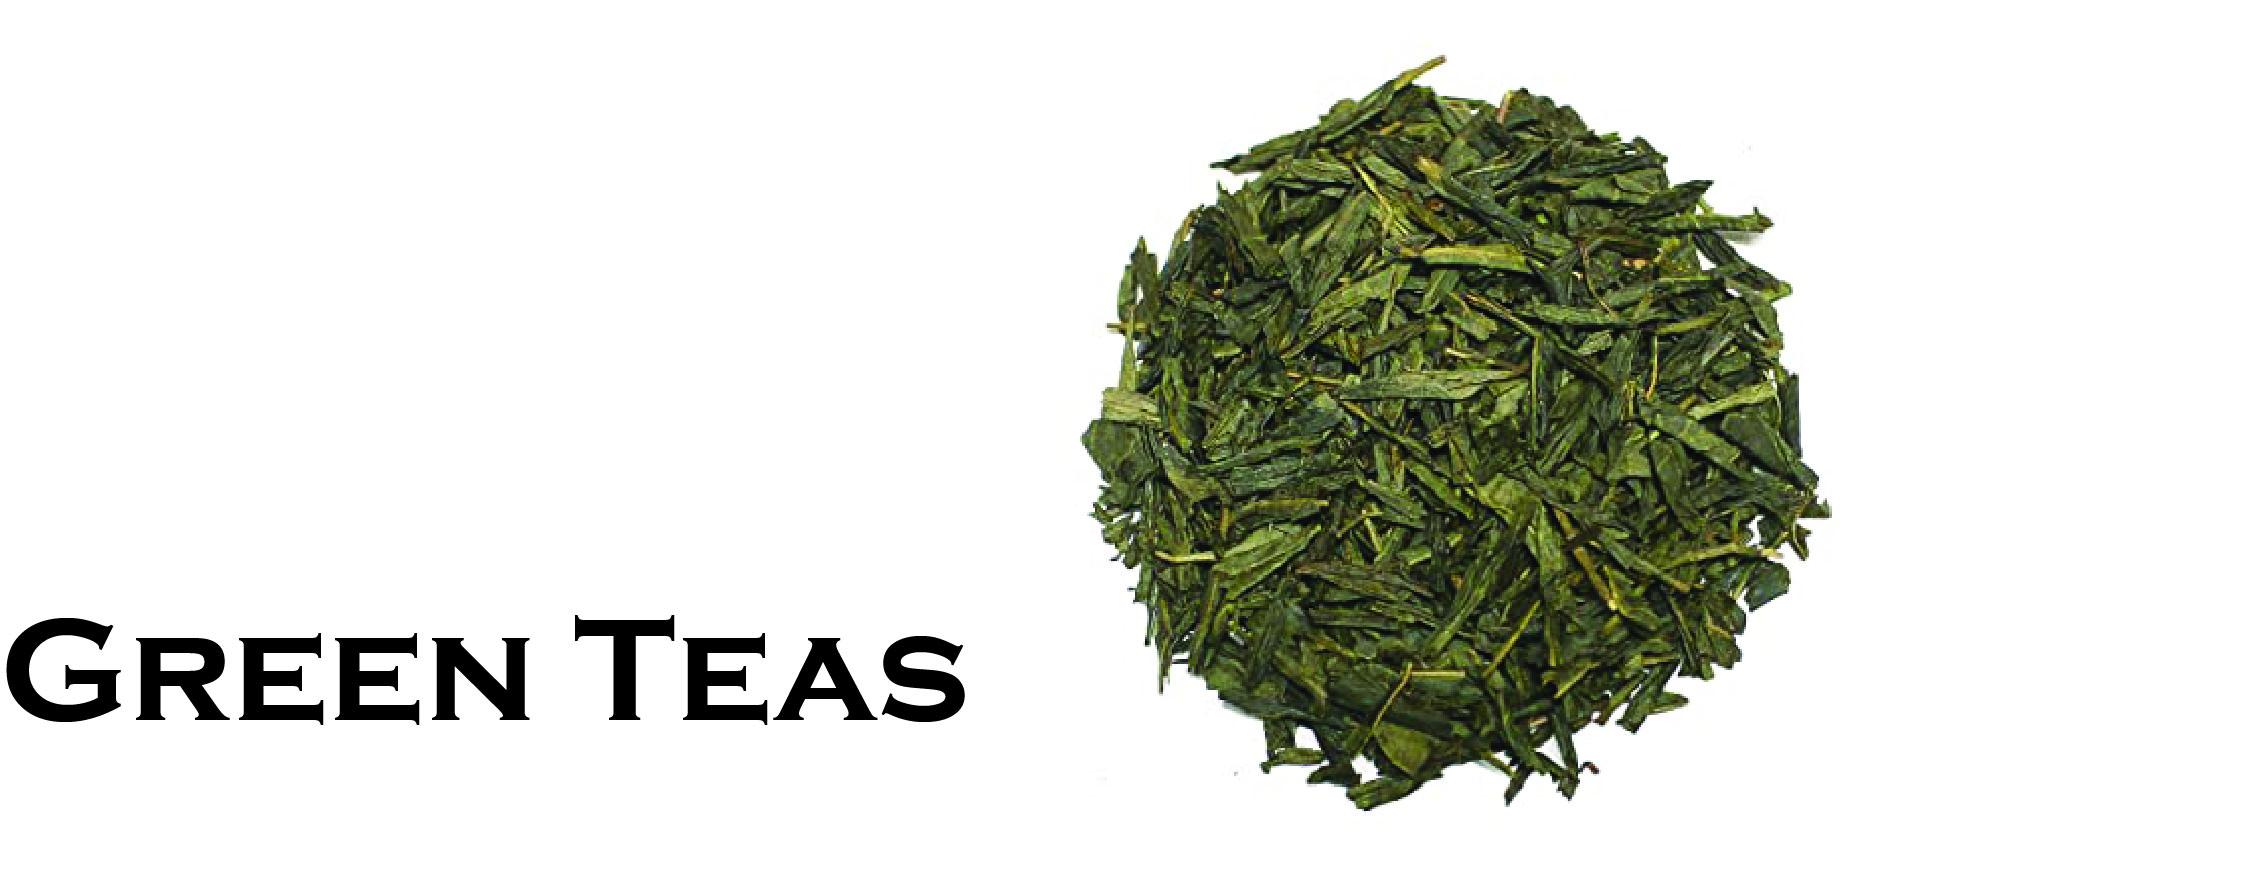 Cuban Brothers Premium Green Tea